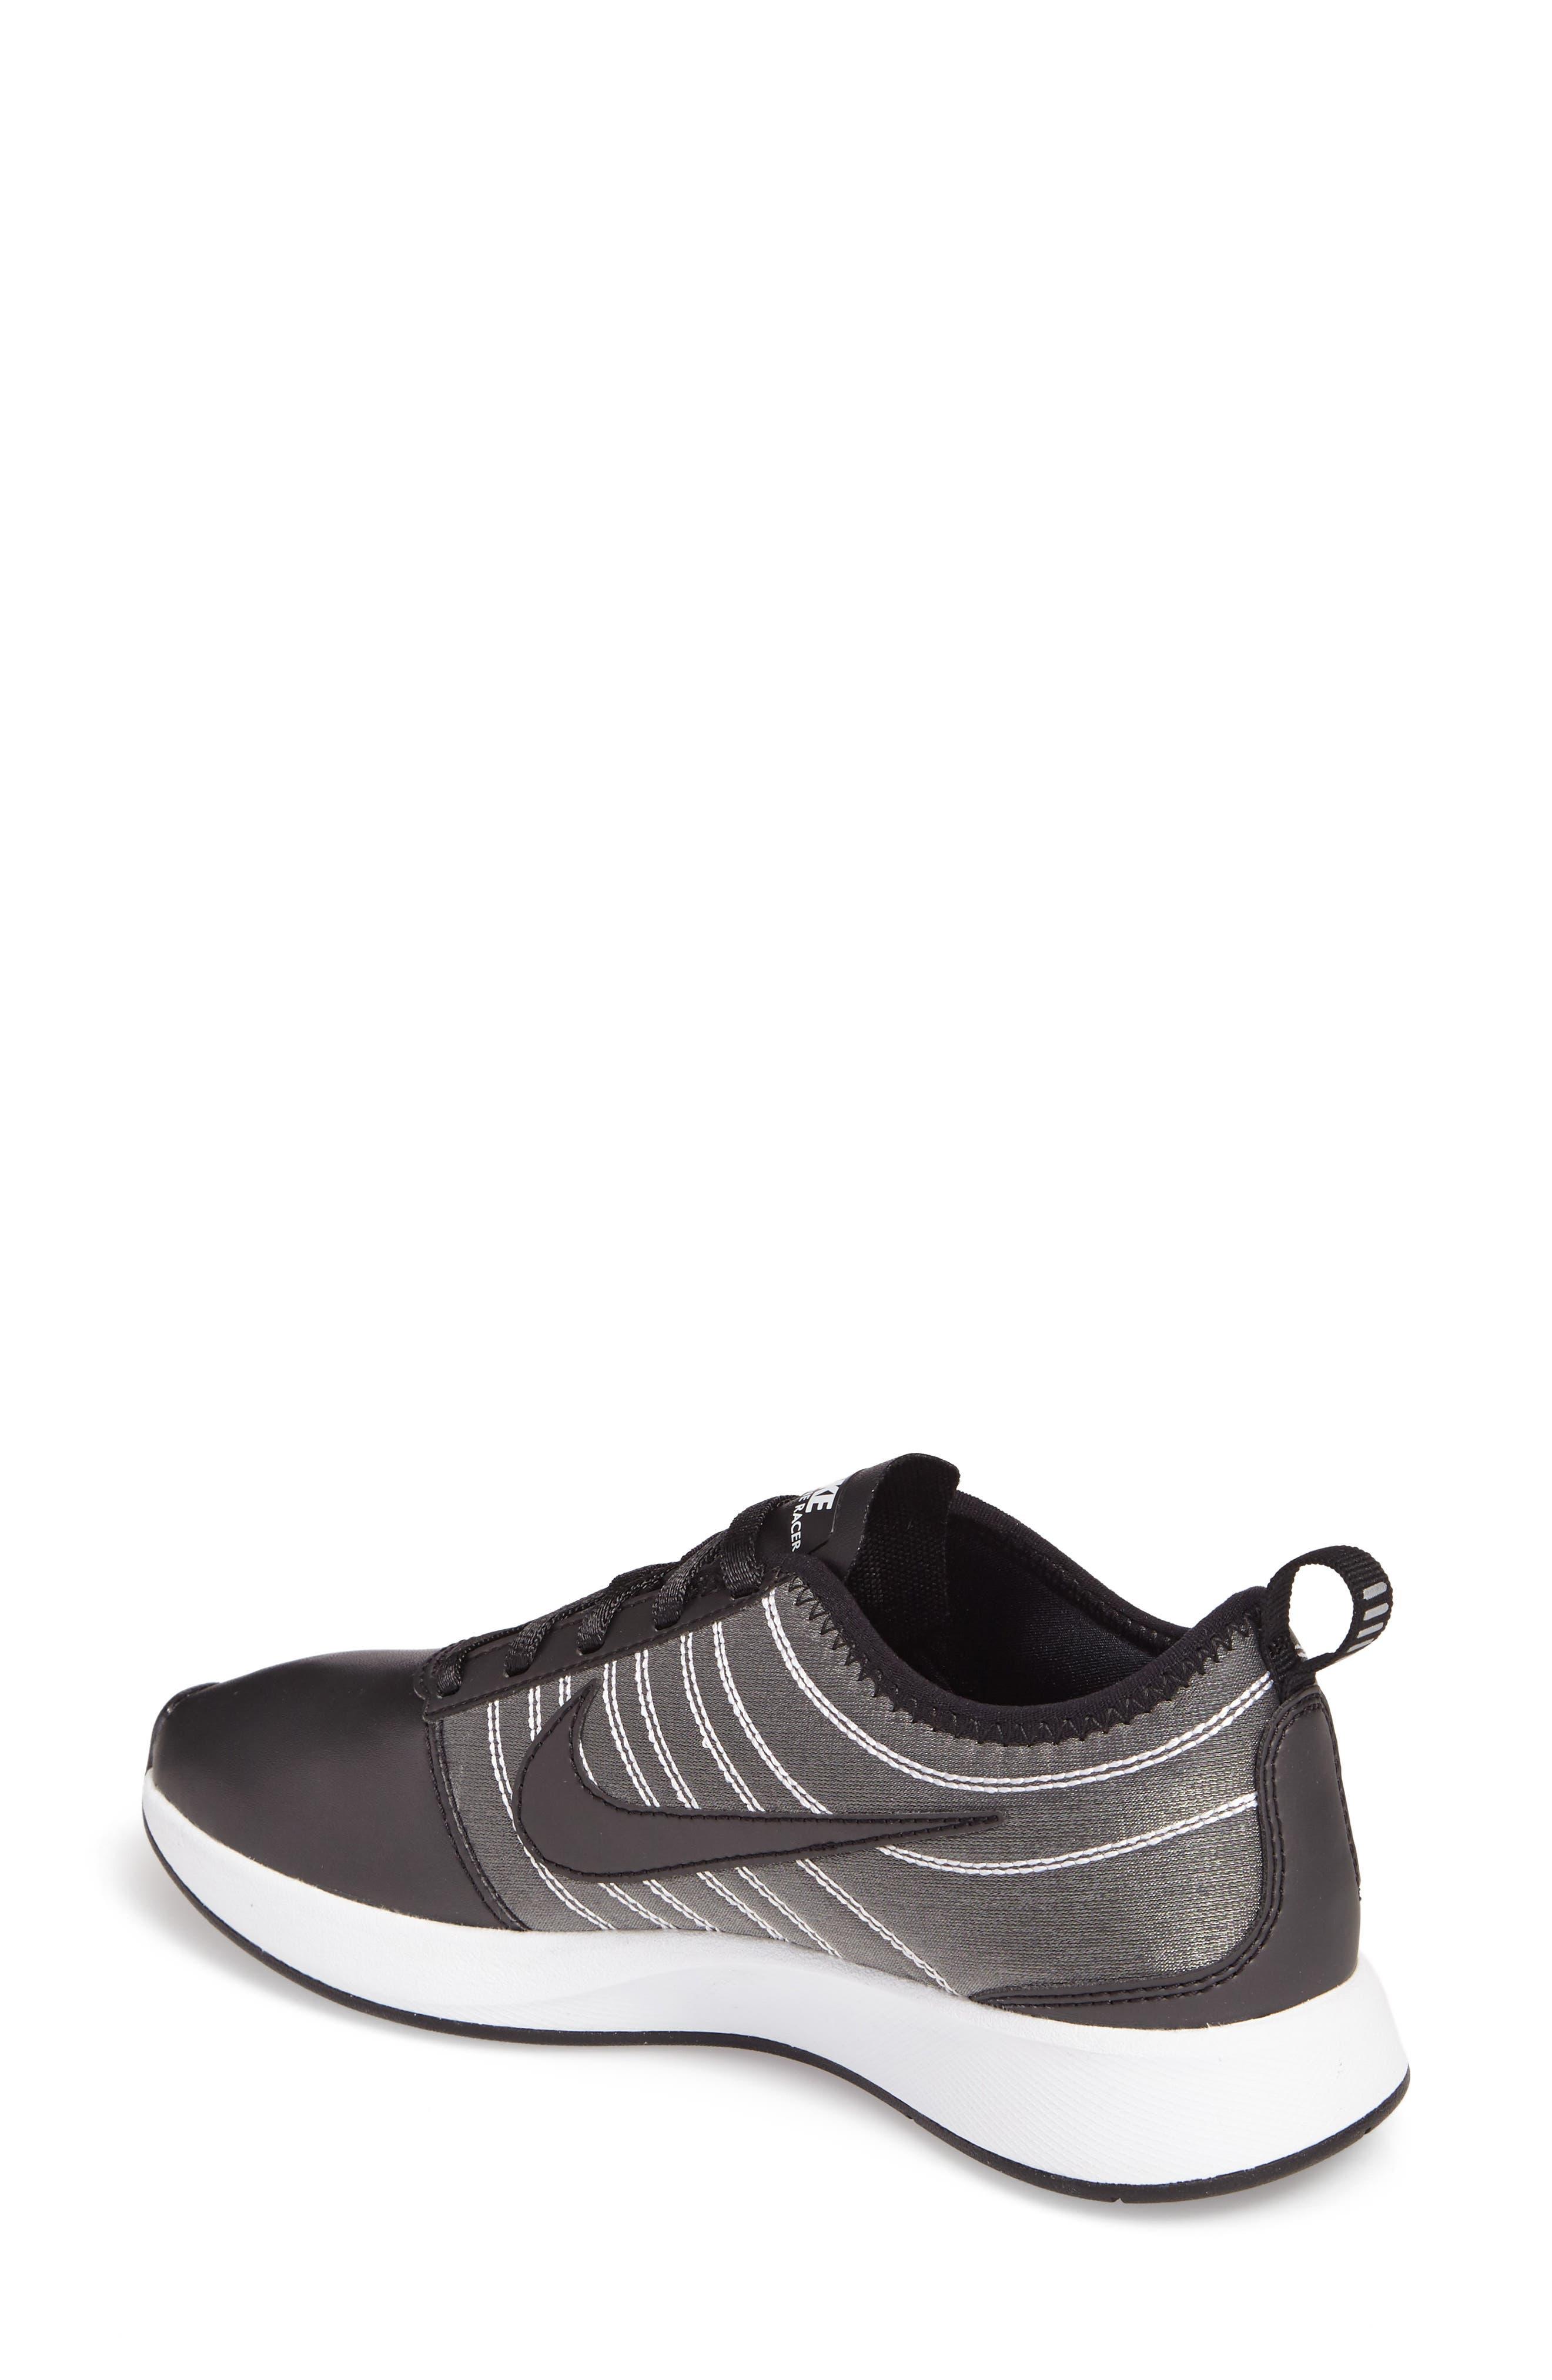 Dualtone Racer PRM Sneaker,                             Alternate thumbnail 7, color,